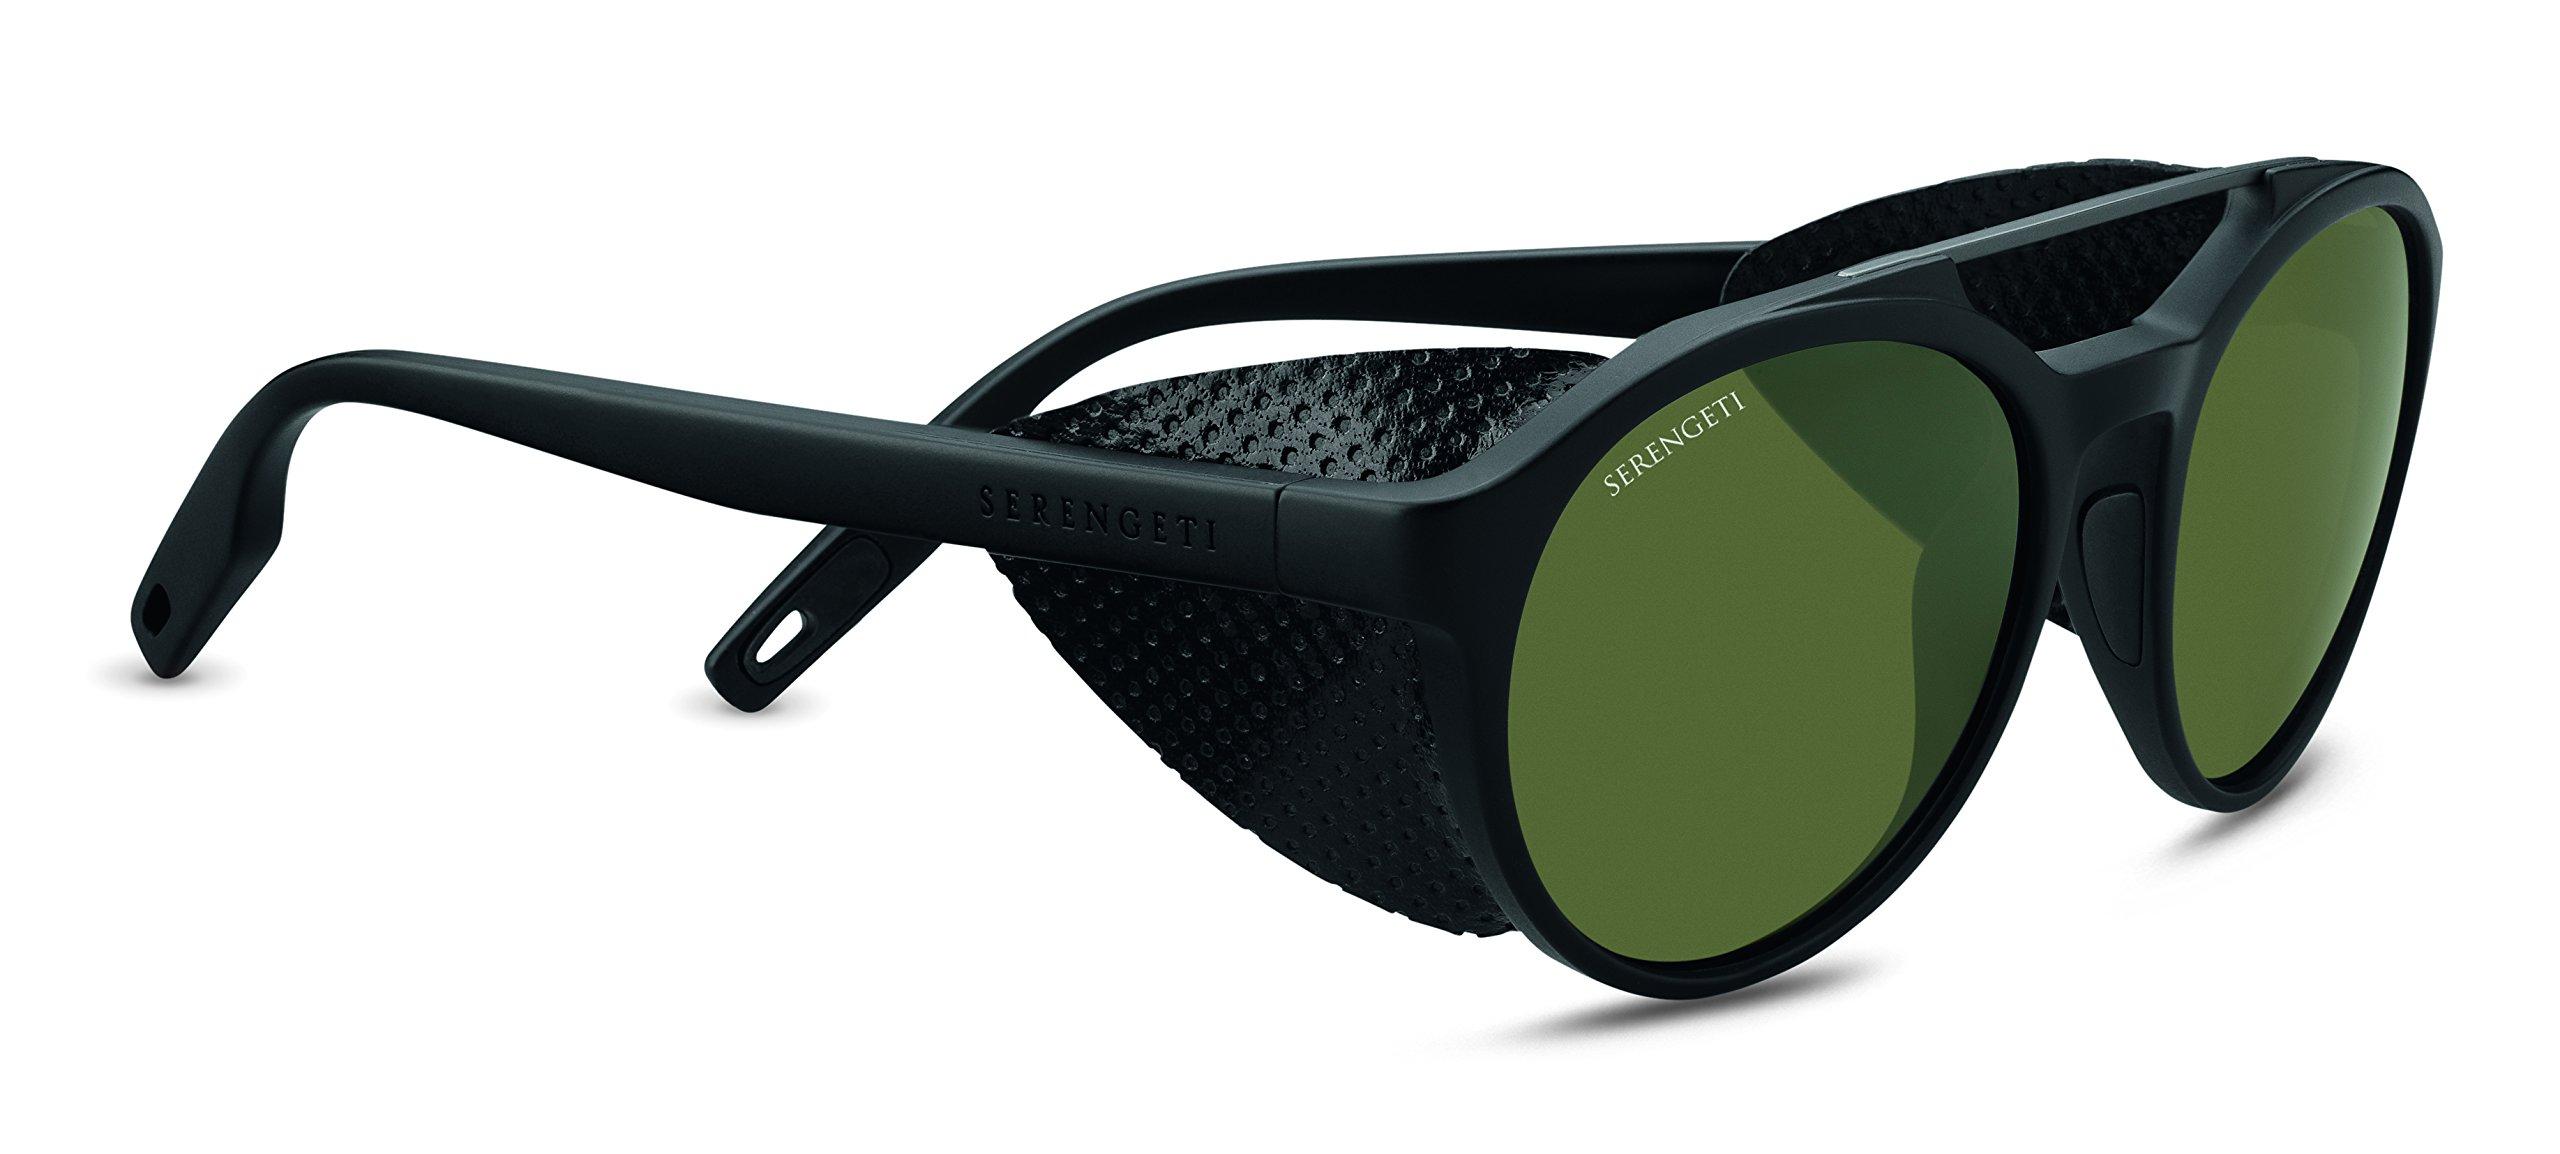 Serengeti Leandro Glacier Sunglasses Satin Black/Satin Dark Gunmetal, Green